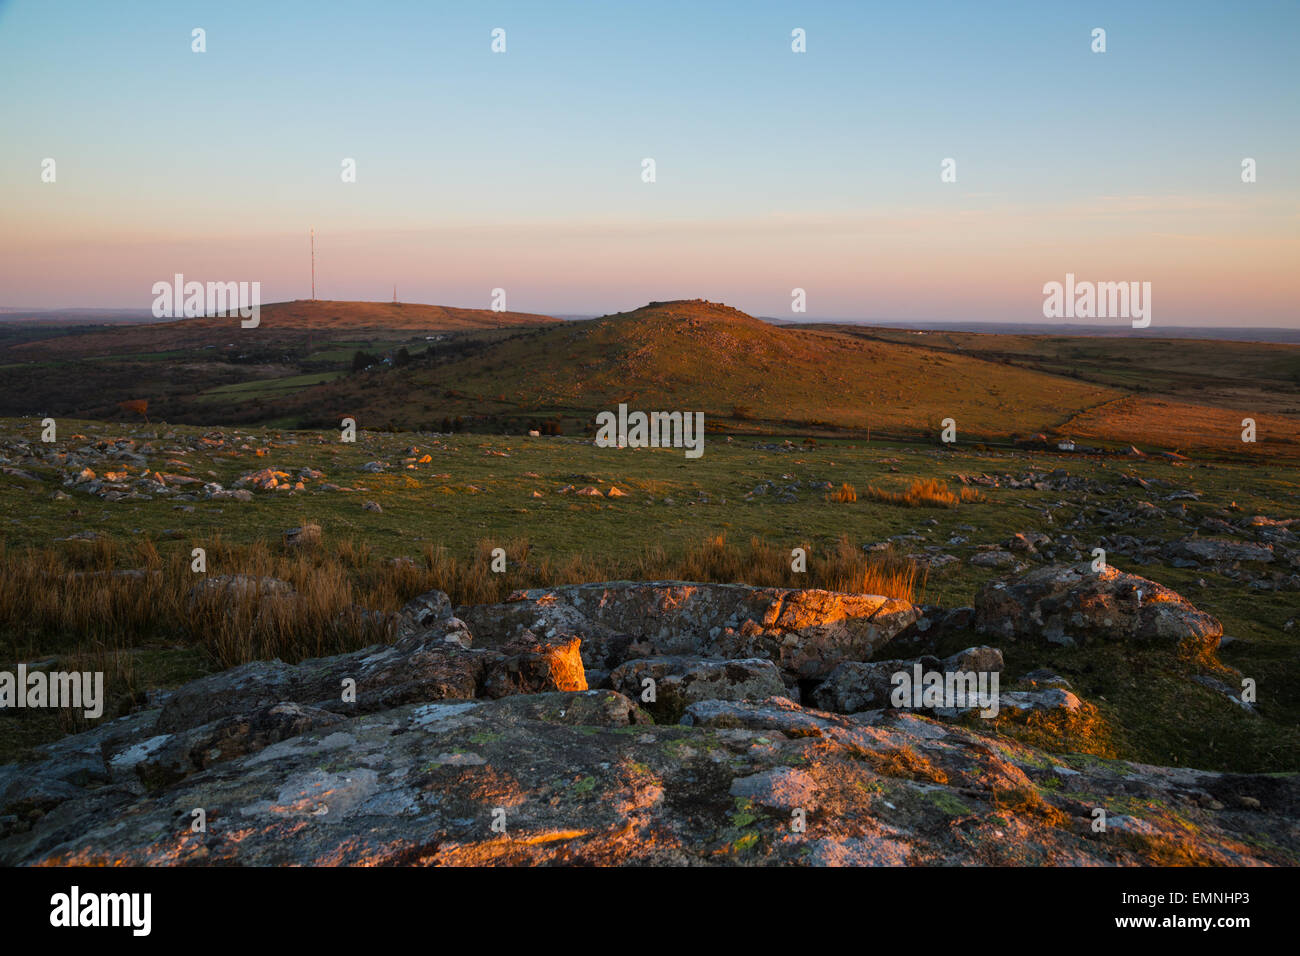 Warm evening light on the moorland landcape on bodmin moor - Stock Image